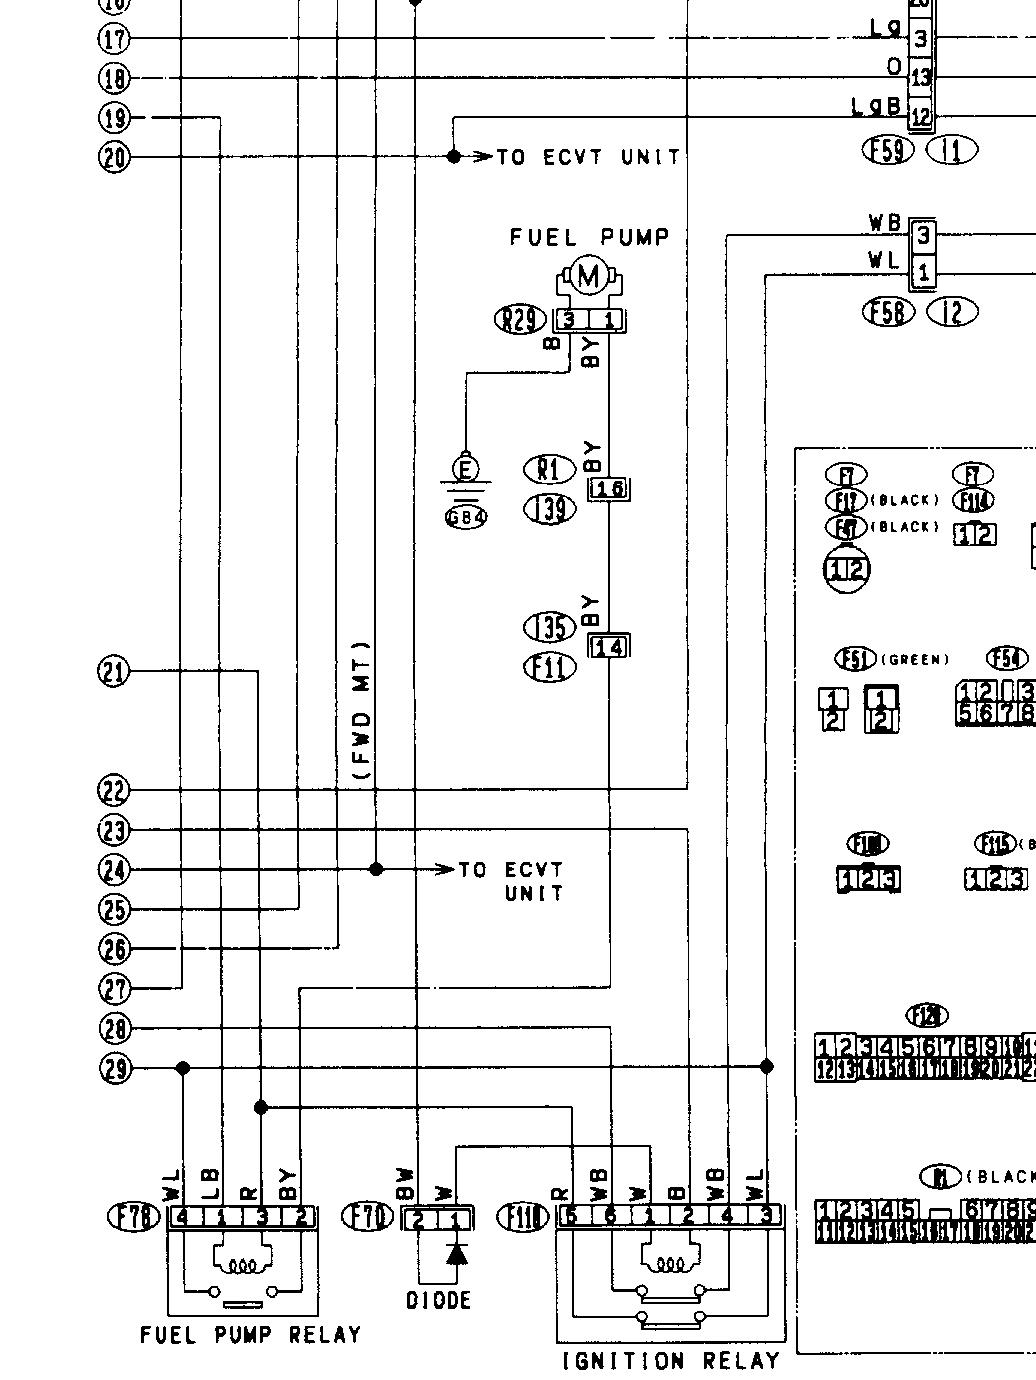 Subaru justy alternator wiring diagram electrical work wiring subaru ac wiring diagram free download wiring diagram xwiaw subaru rh xwiaw us subaru 3 wire alternator wiring diagram lexus gs300 alternator wiring diagram cheapraybanclubmaster Gallery